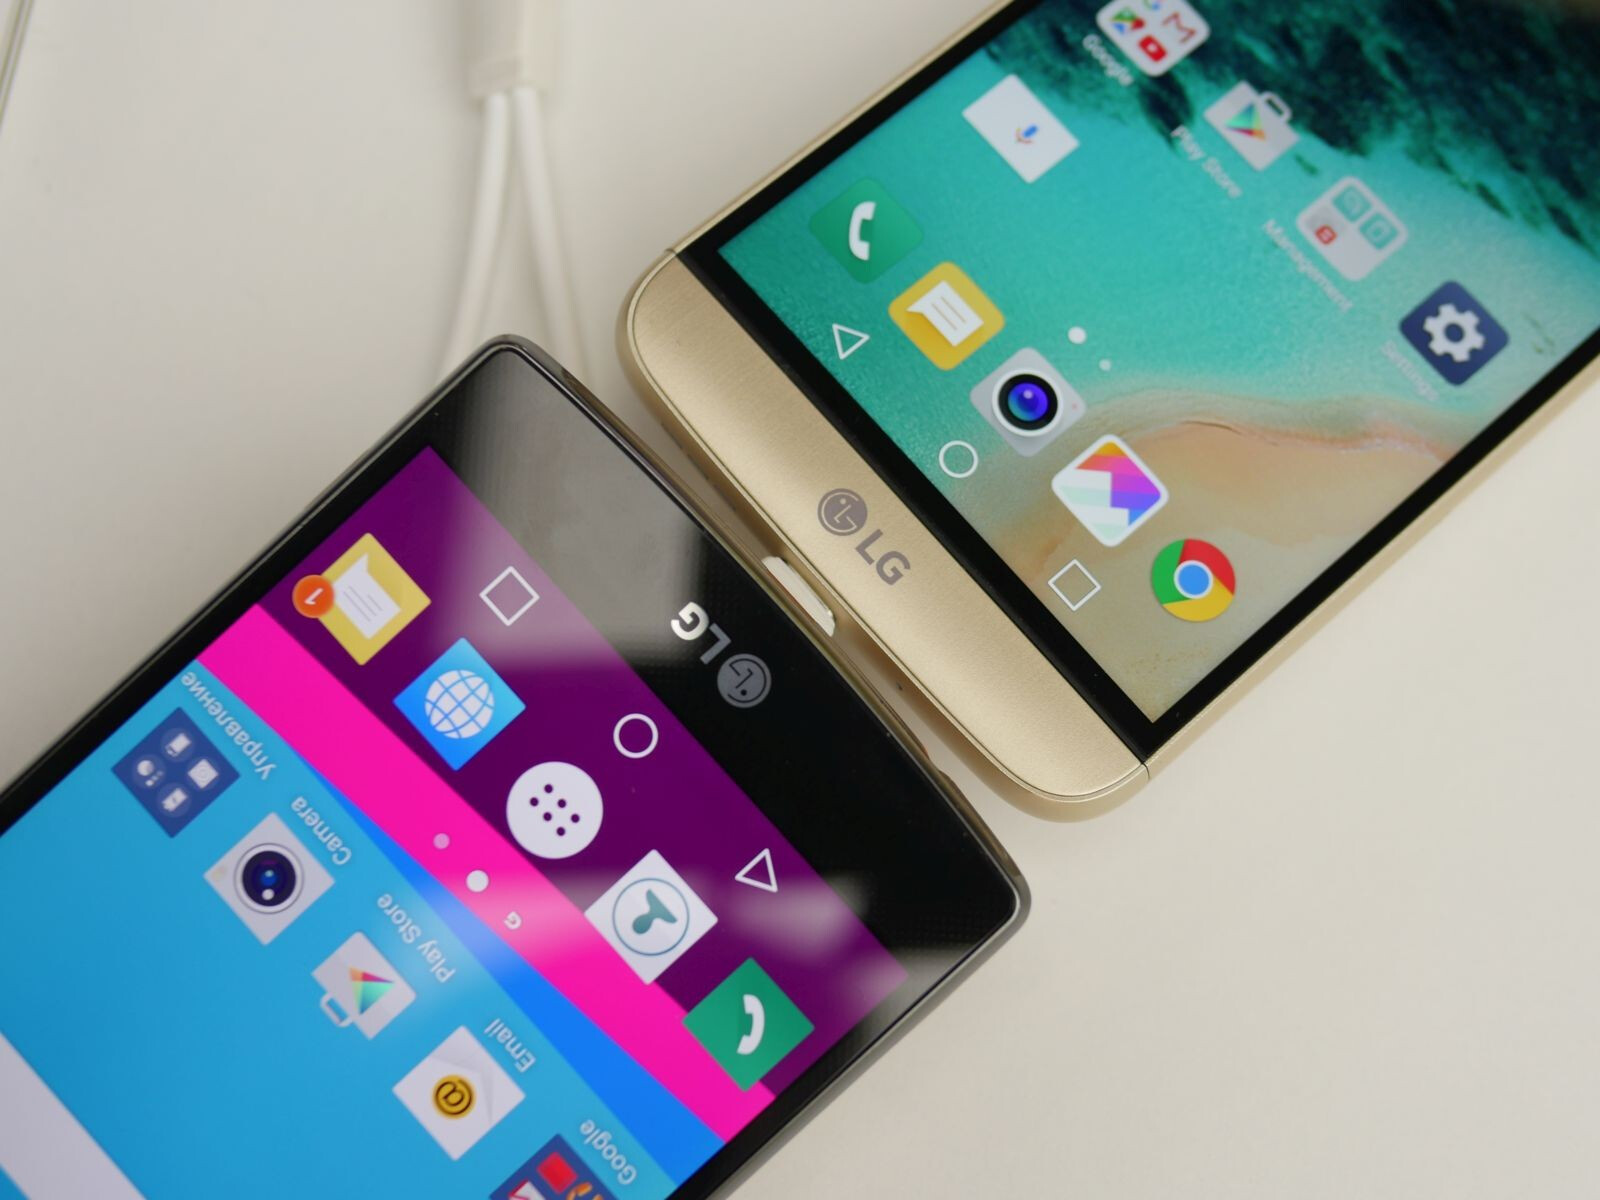 LG G5 vs LG G4: first look | PhoneArena reviews - PhoneArena